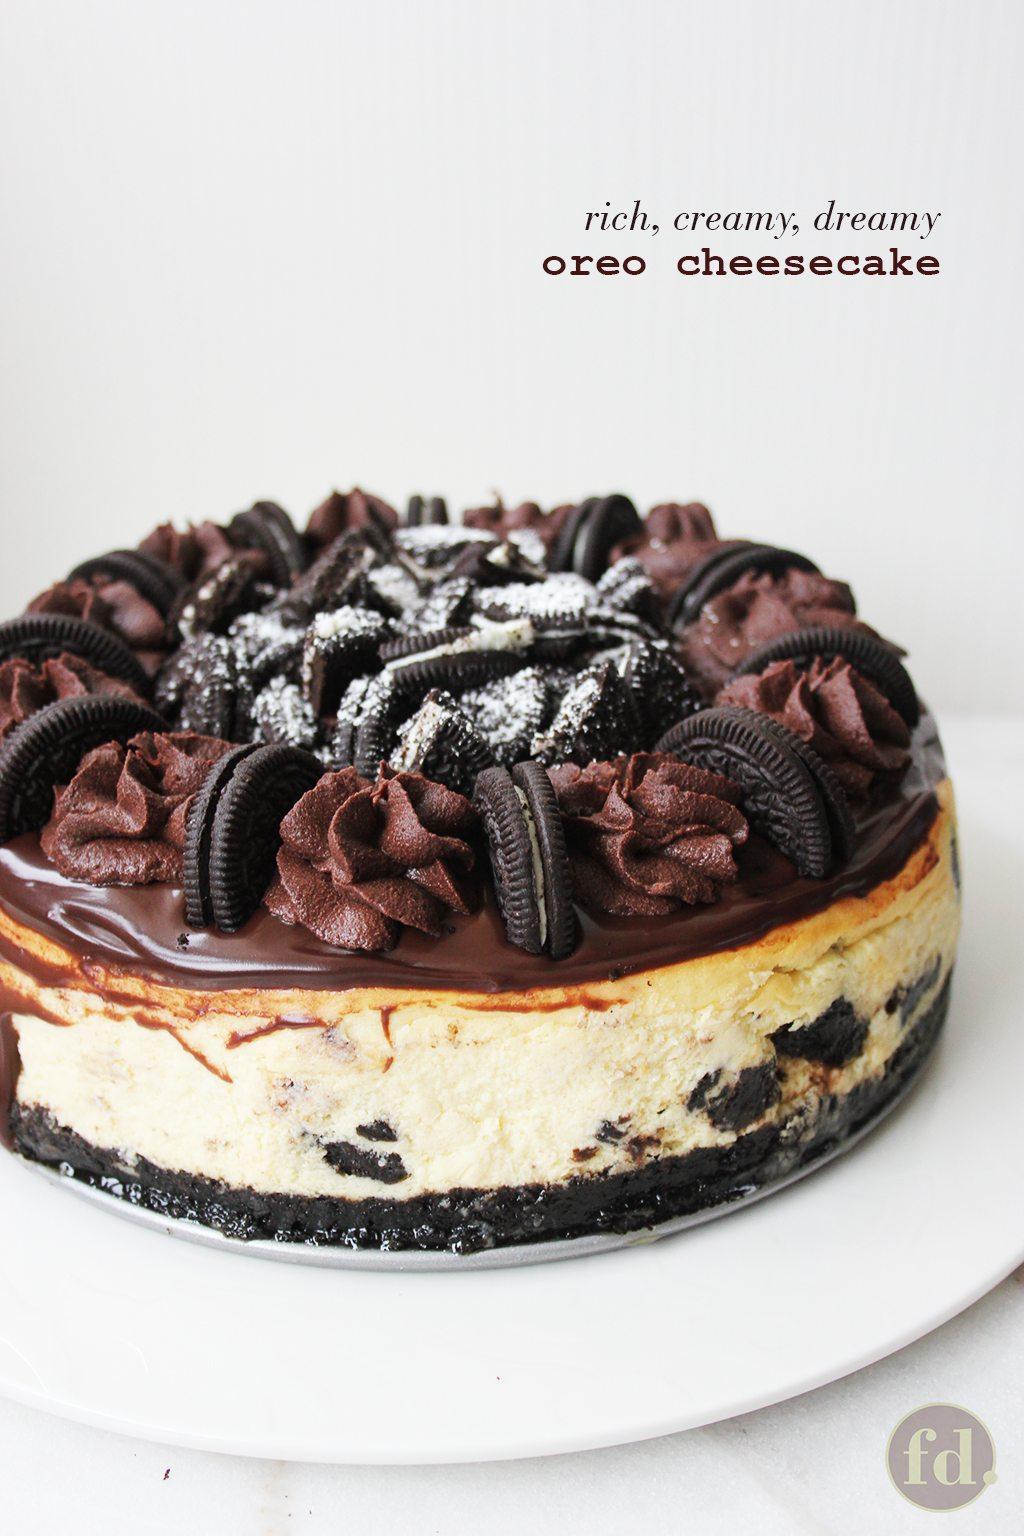 oreo_cheesecake_13